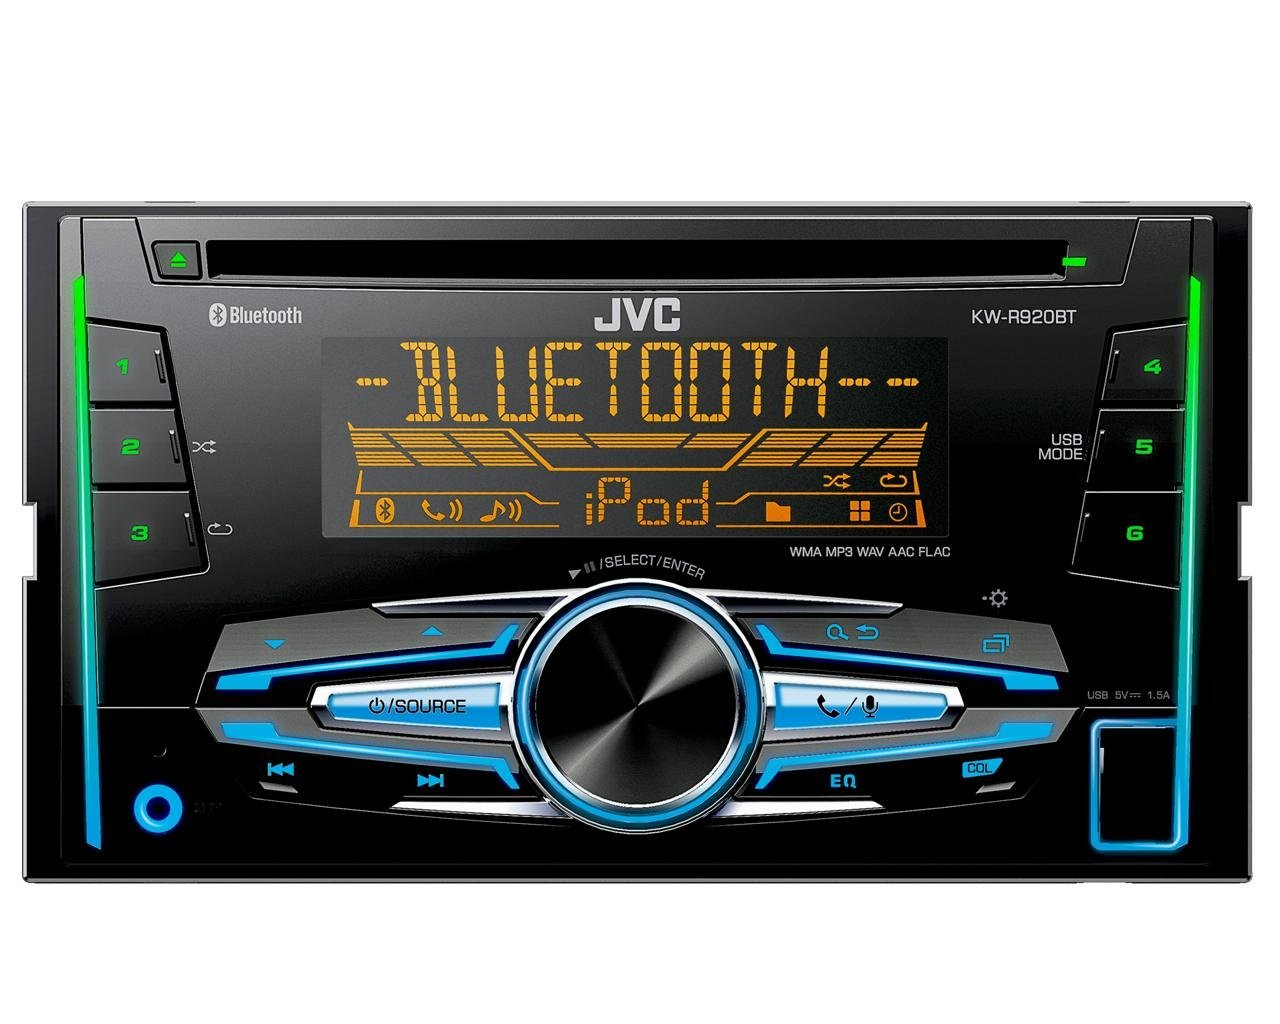 JVC KW-R920BT Autoradio con CD, Tecnologia Bluetooth Wireless e Front USB/AUX Input